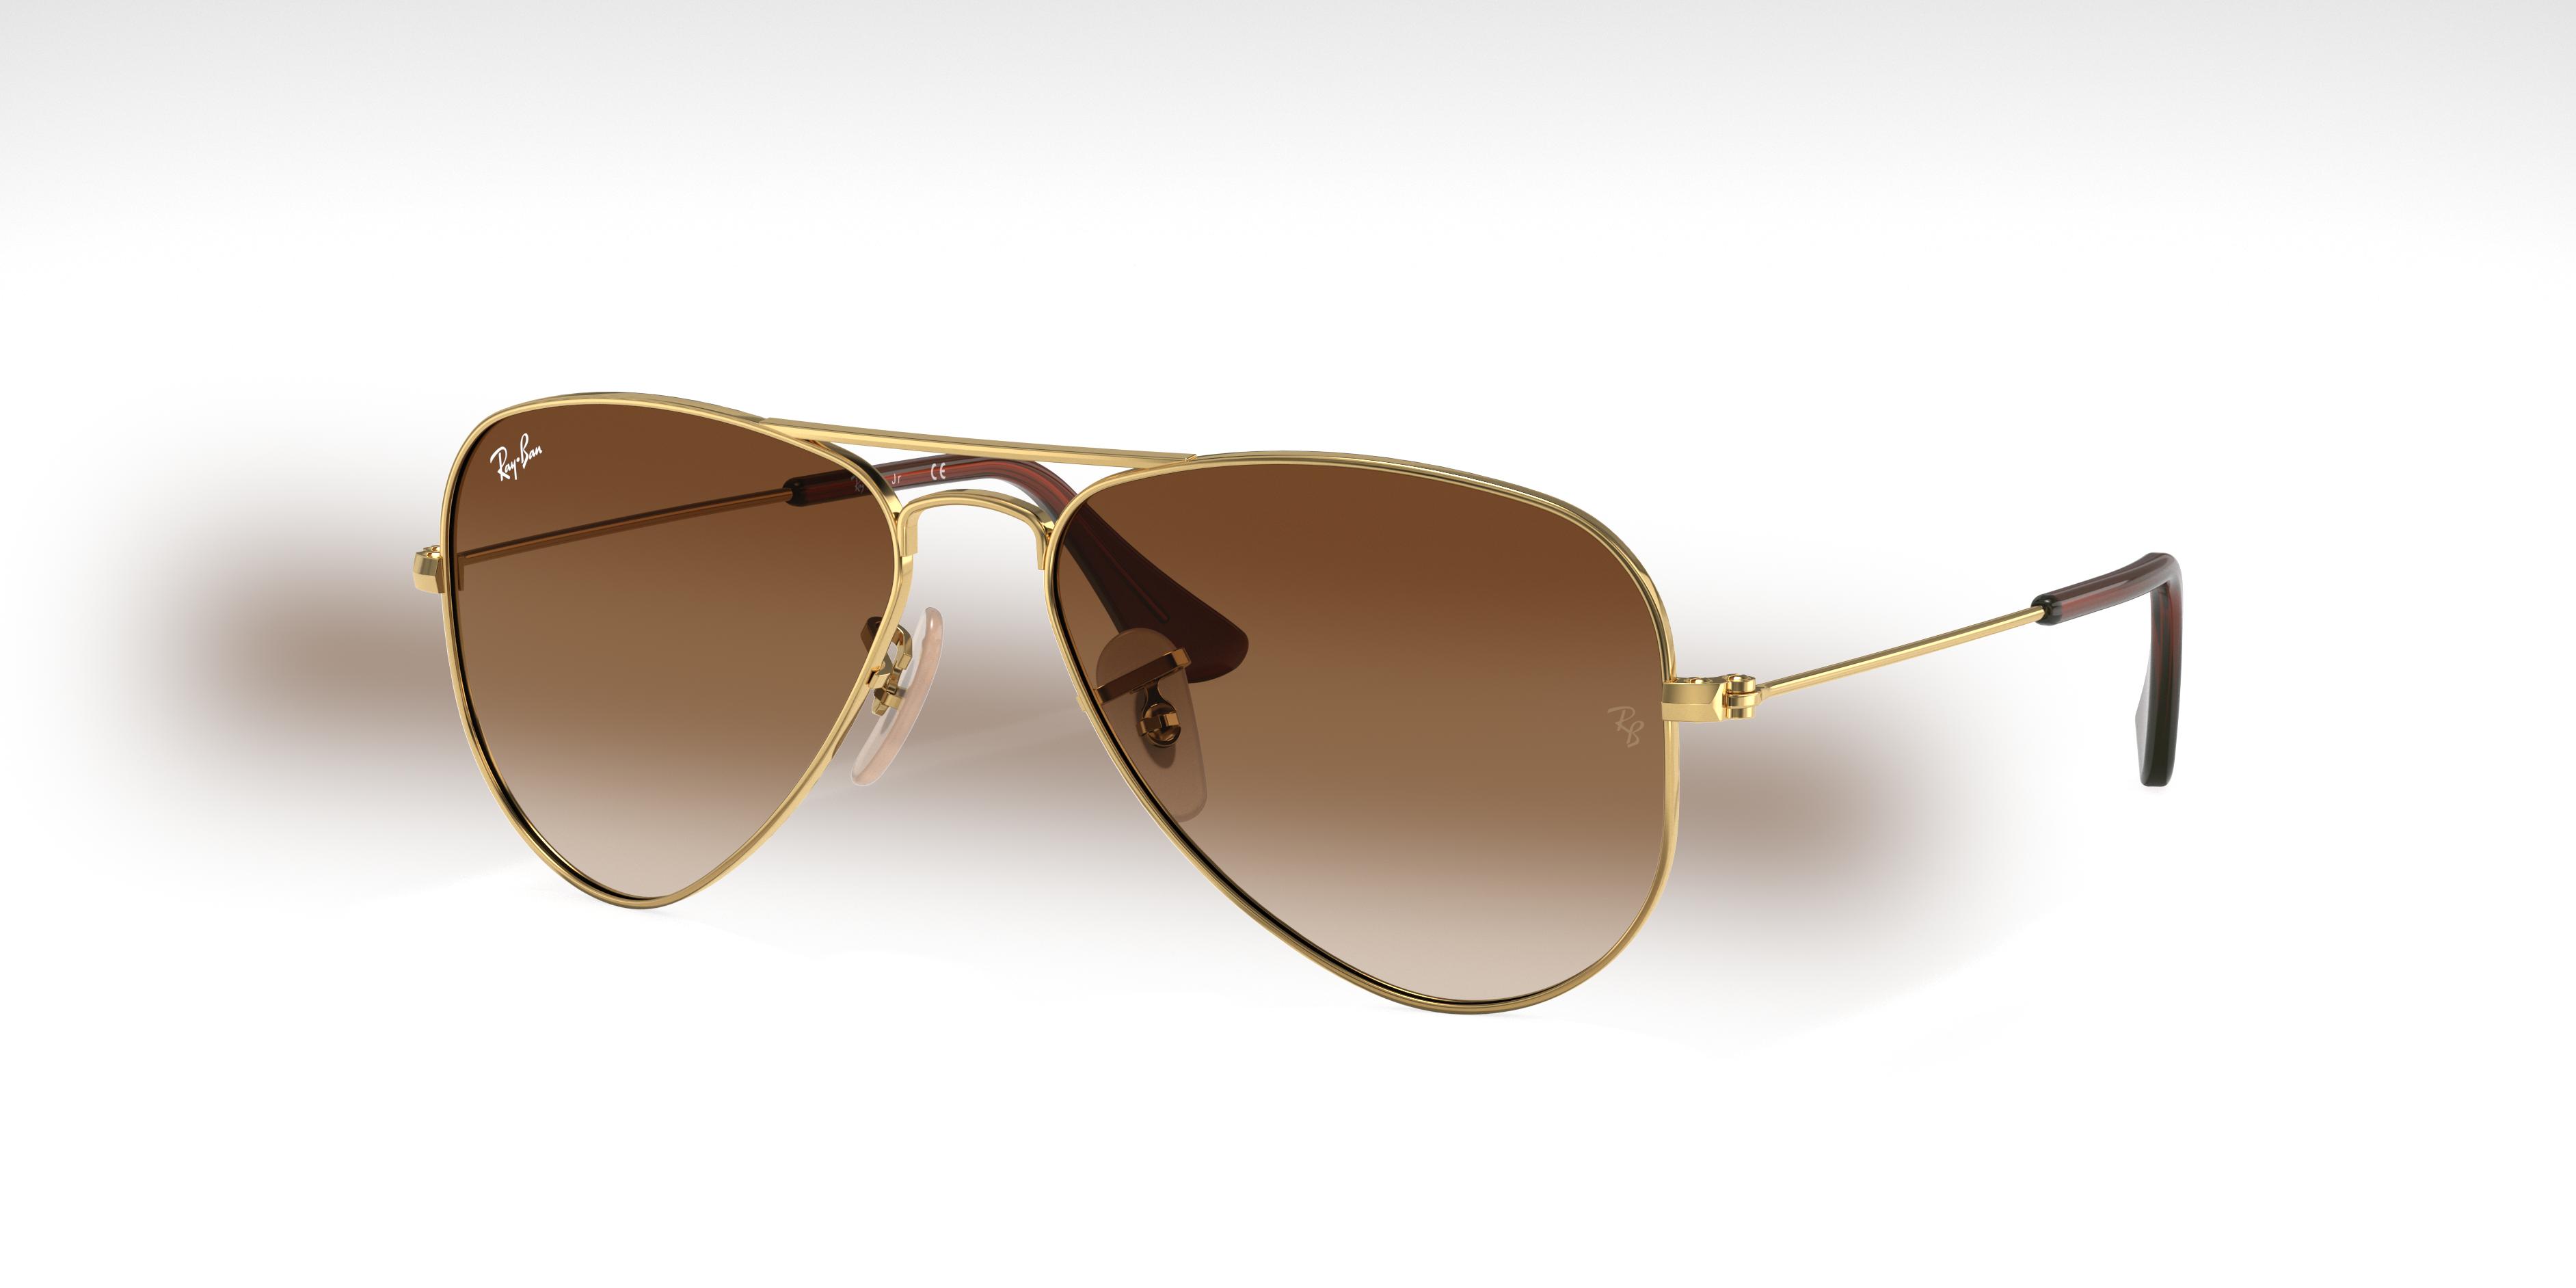 Ray-Ban Aviator Junior Gold, Brown Lenses - RJ9506S